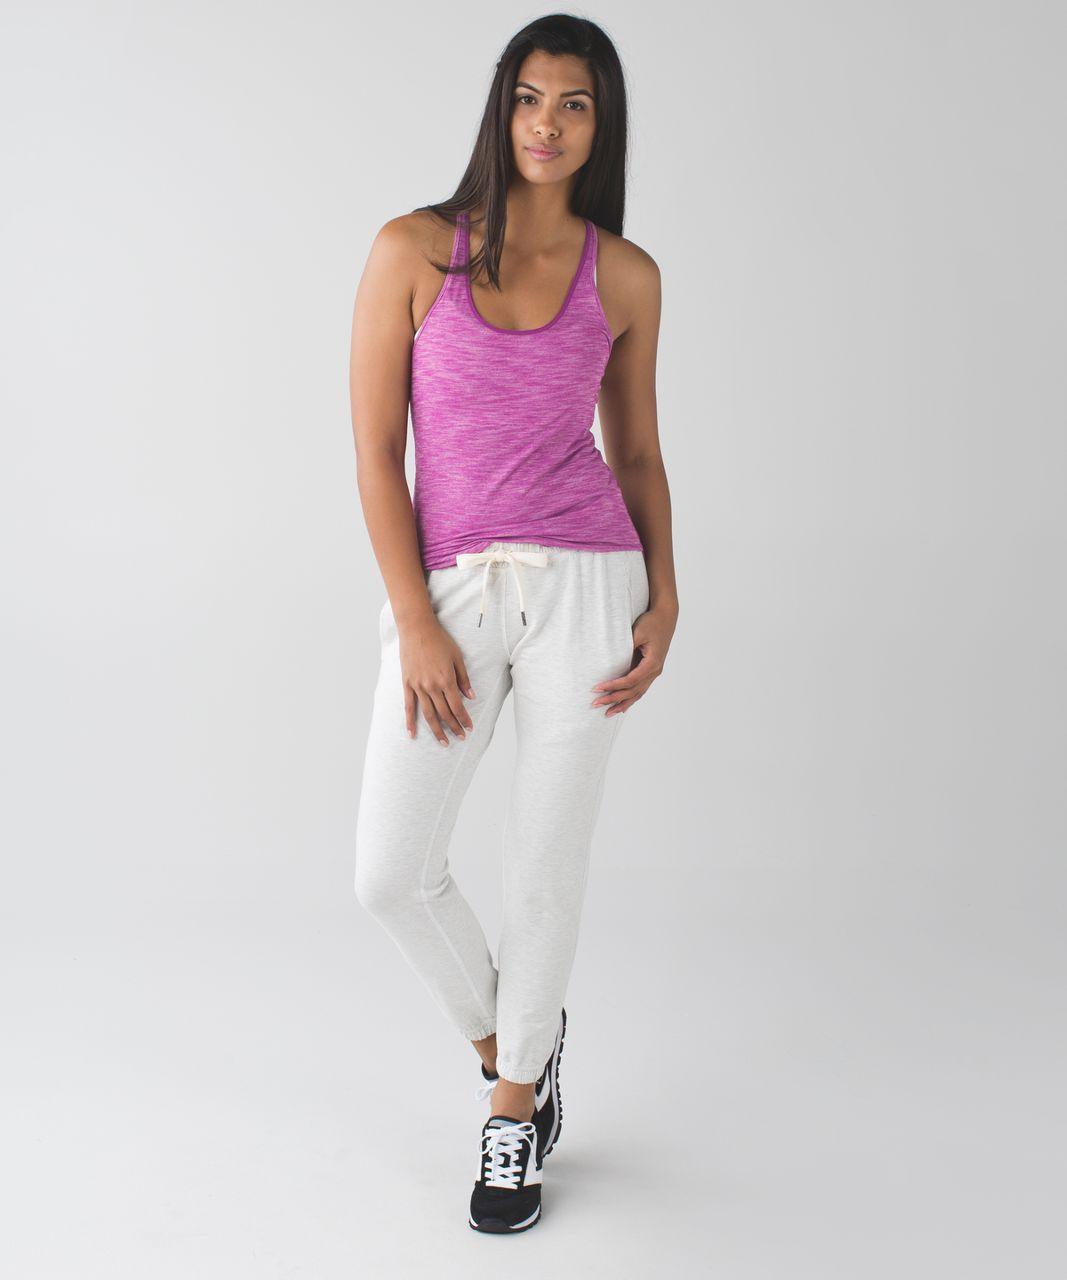 Lululemon What The Sport Singlet - Heathered Regal Plum